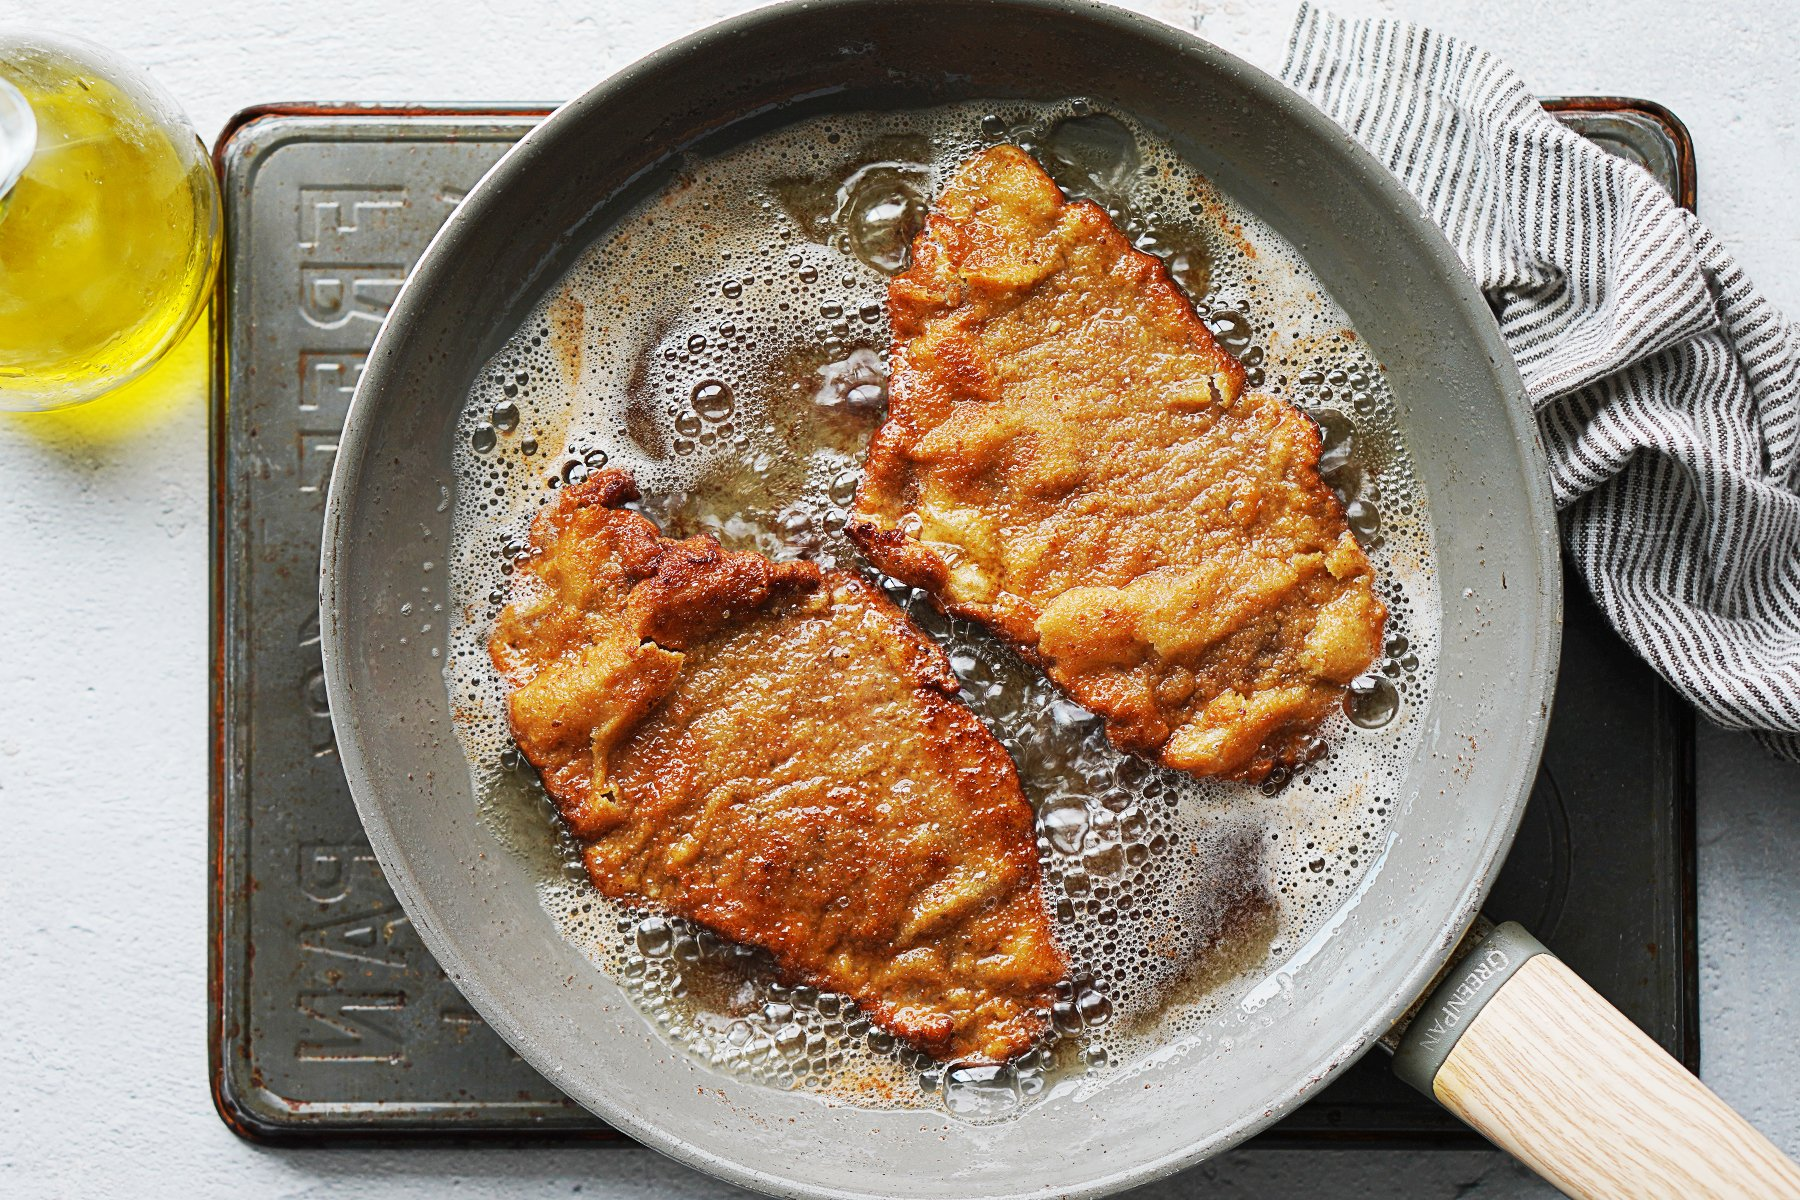 Cooking crispy breaded steaks in a skillet